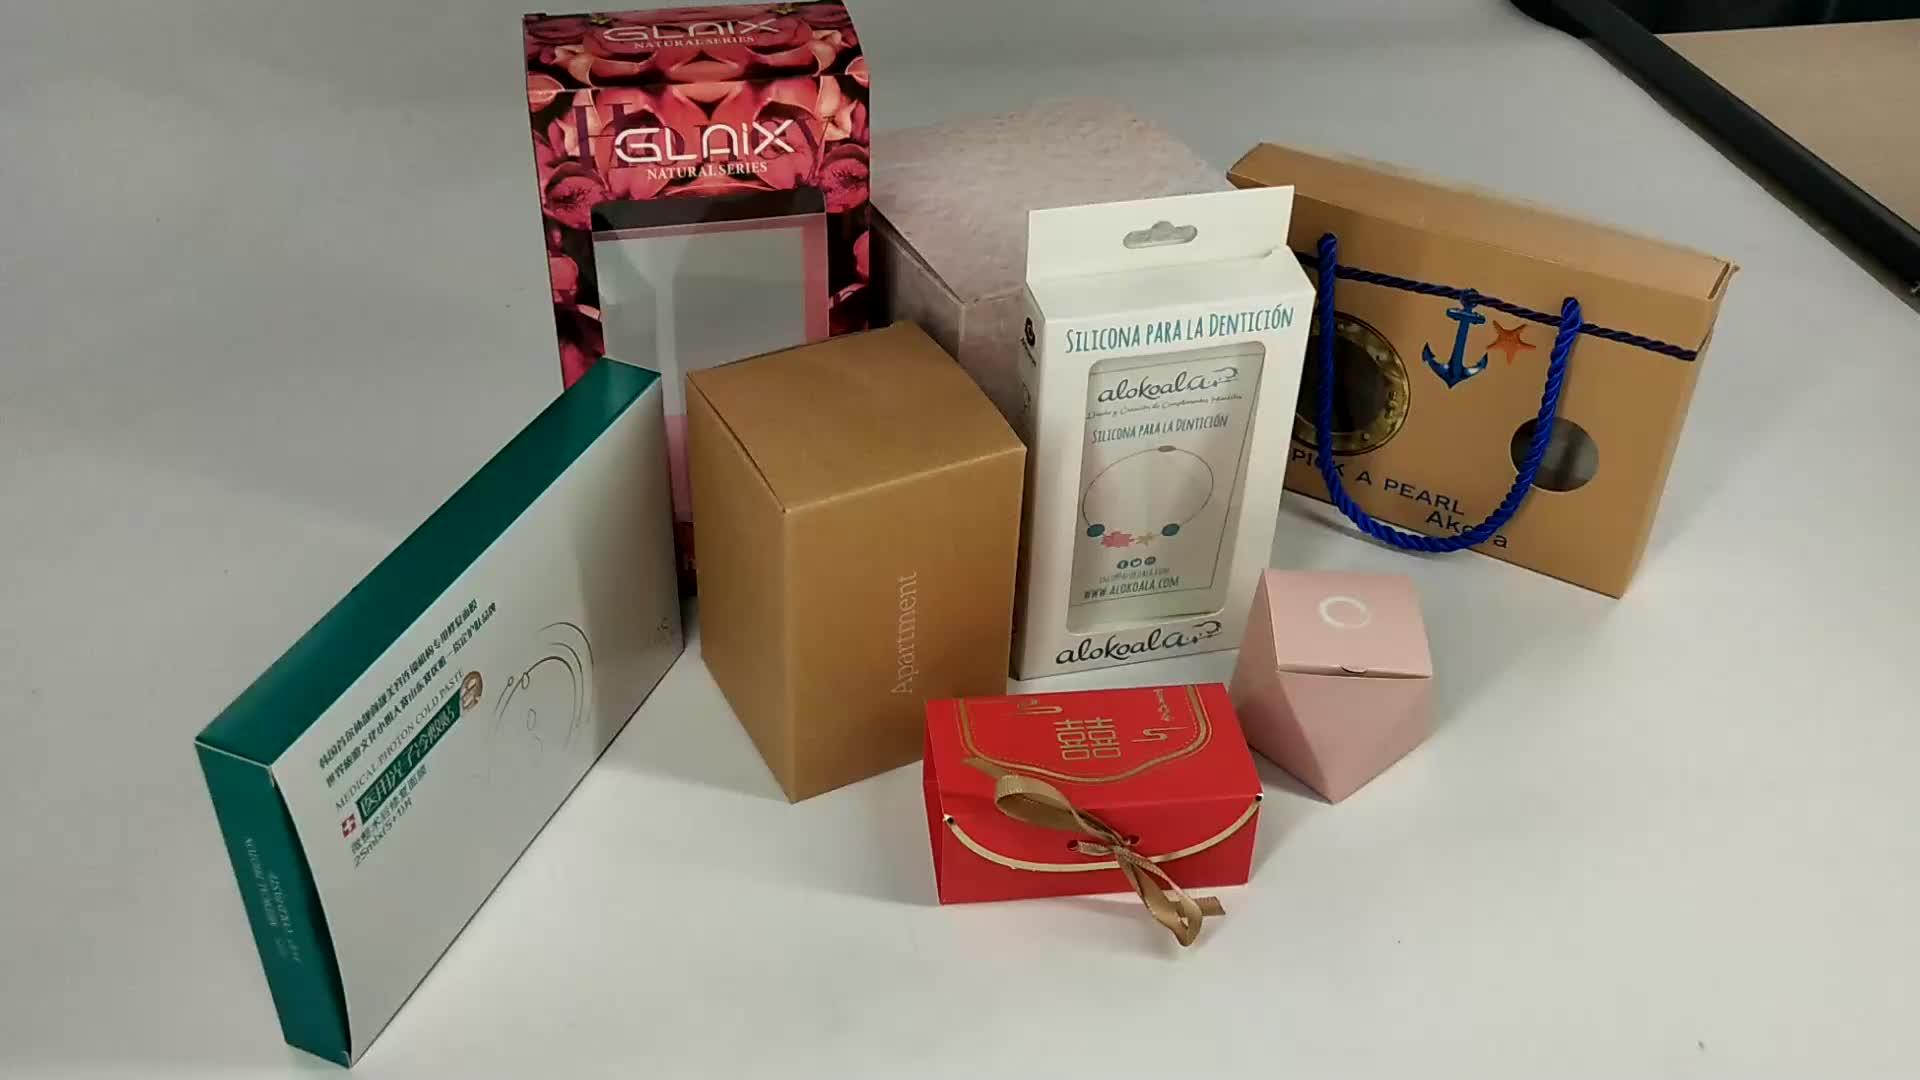 Kraft Schublade Box/Handy Fall Verpackung Box/Handy Fall Verpackung Box